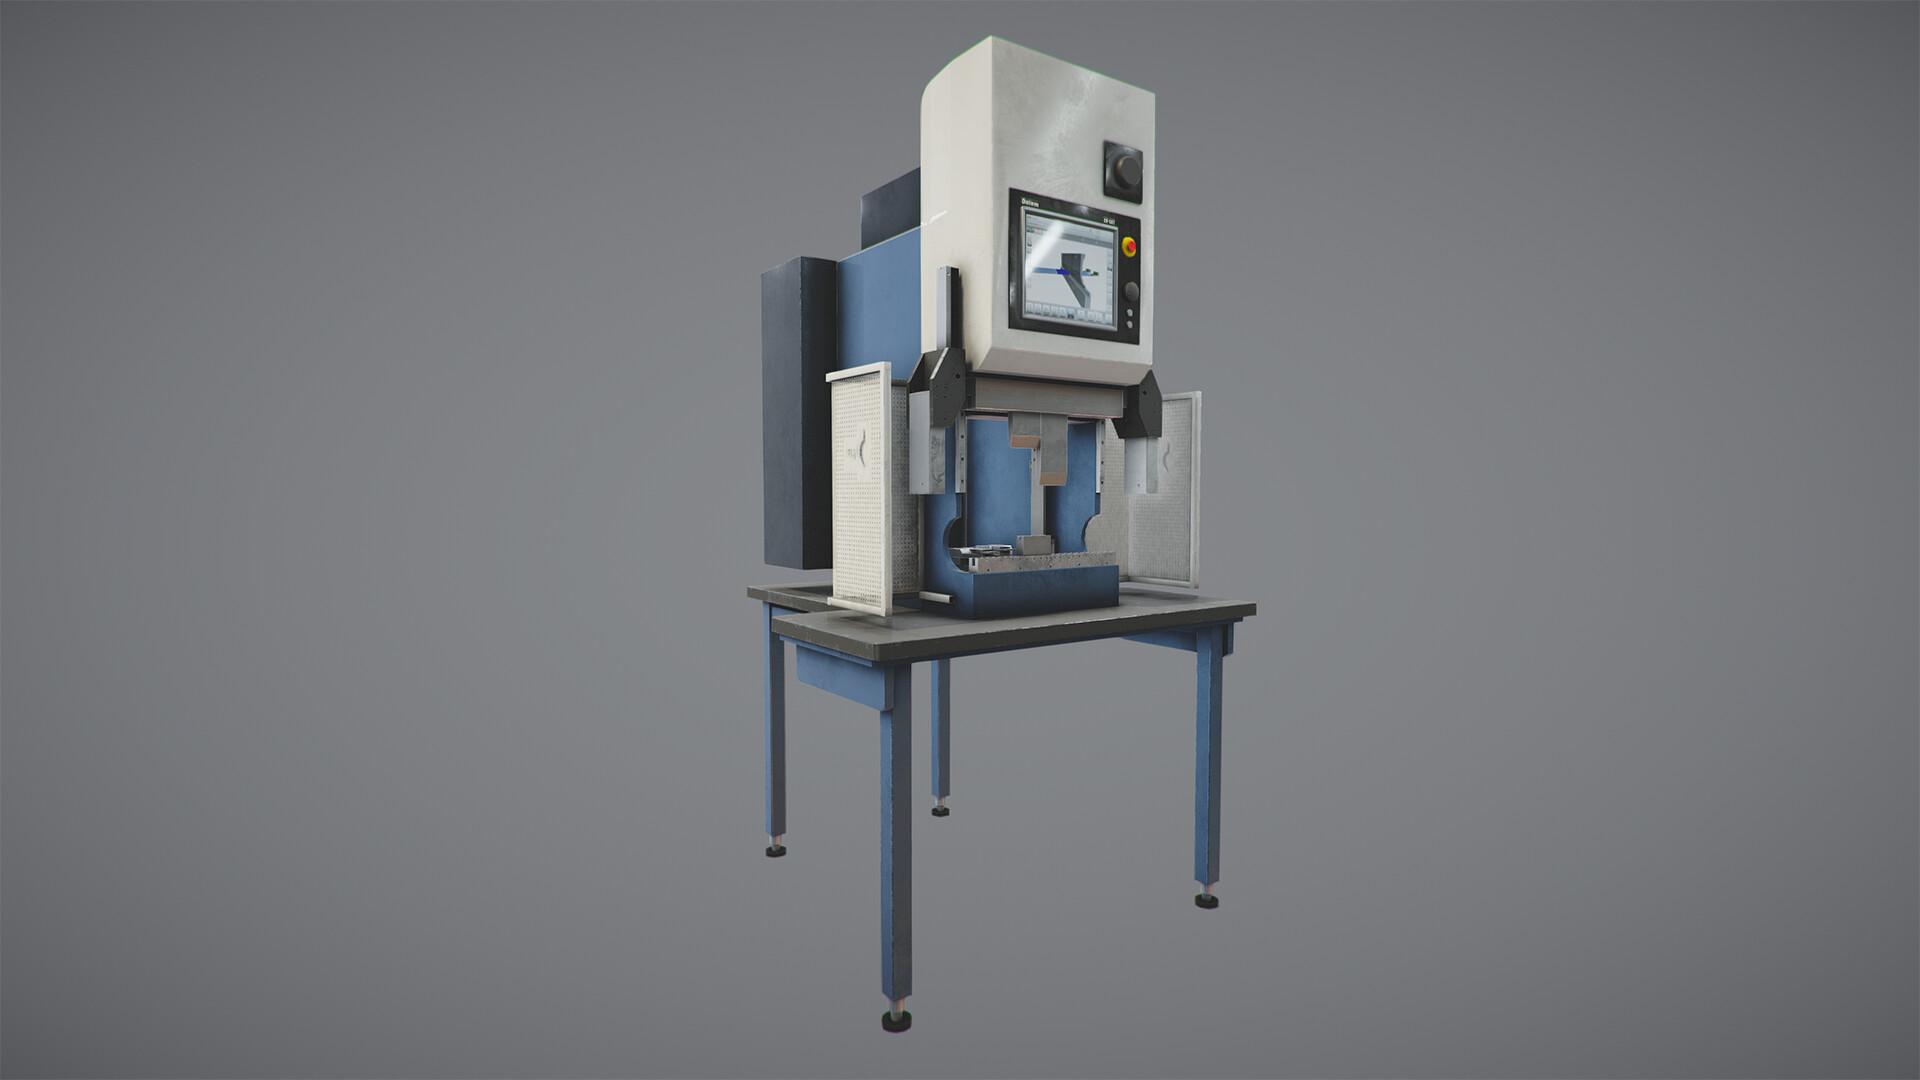 Rutger stegenga machinerypress 05